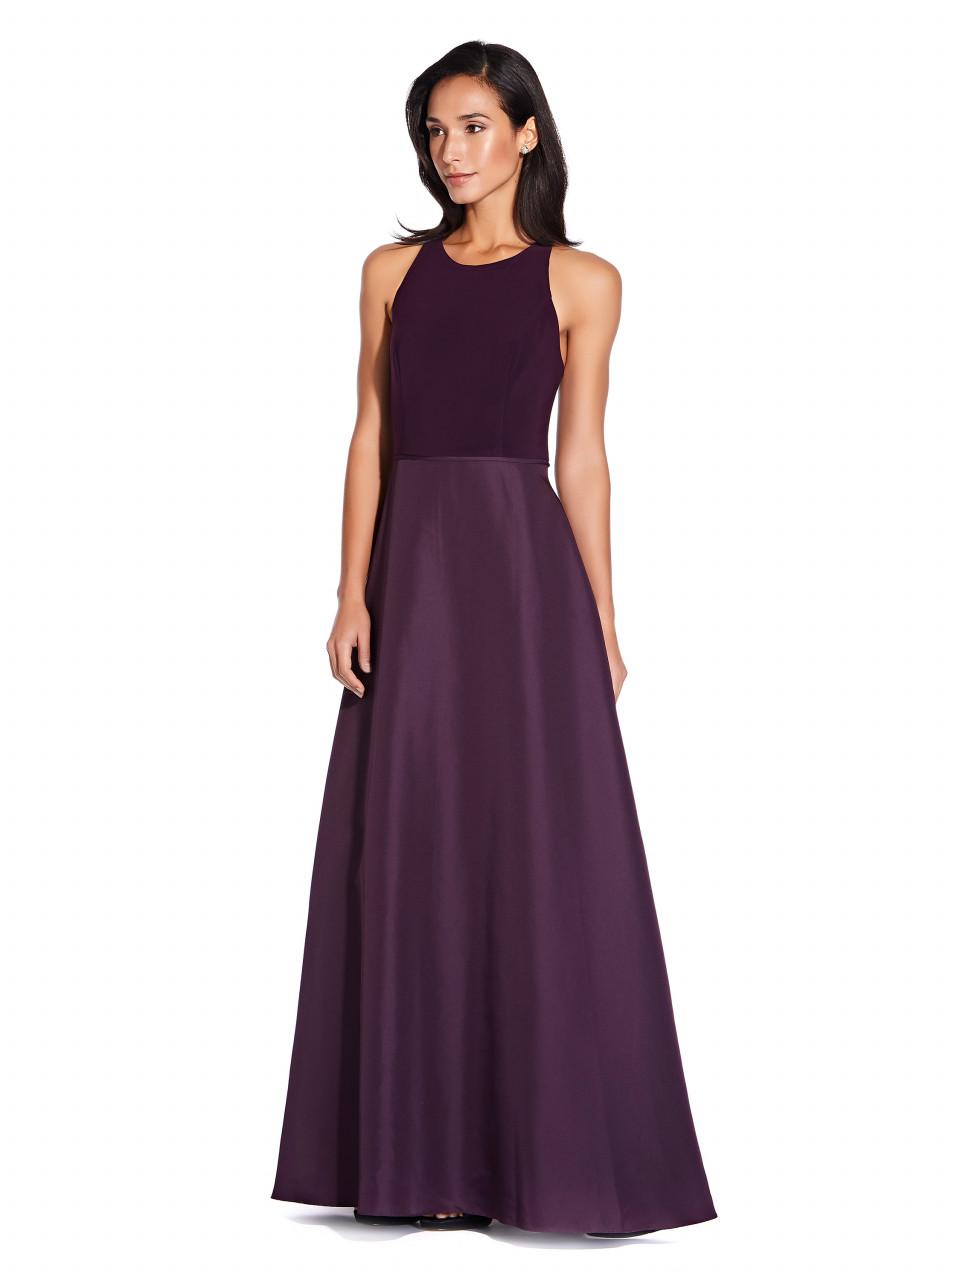 Jersey taffeta dress